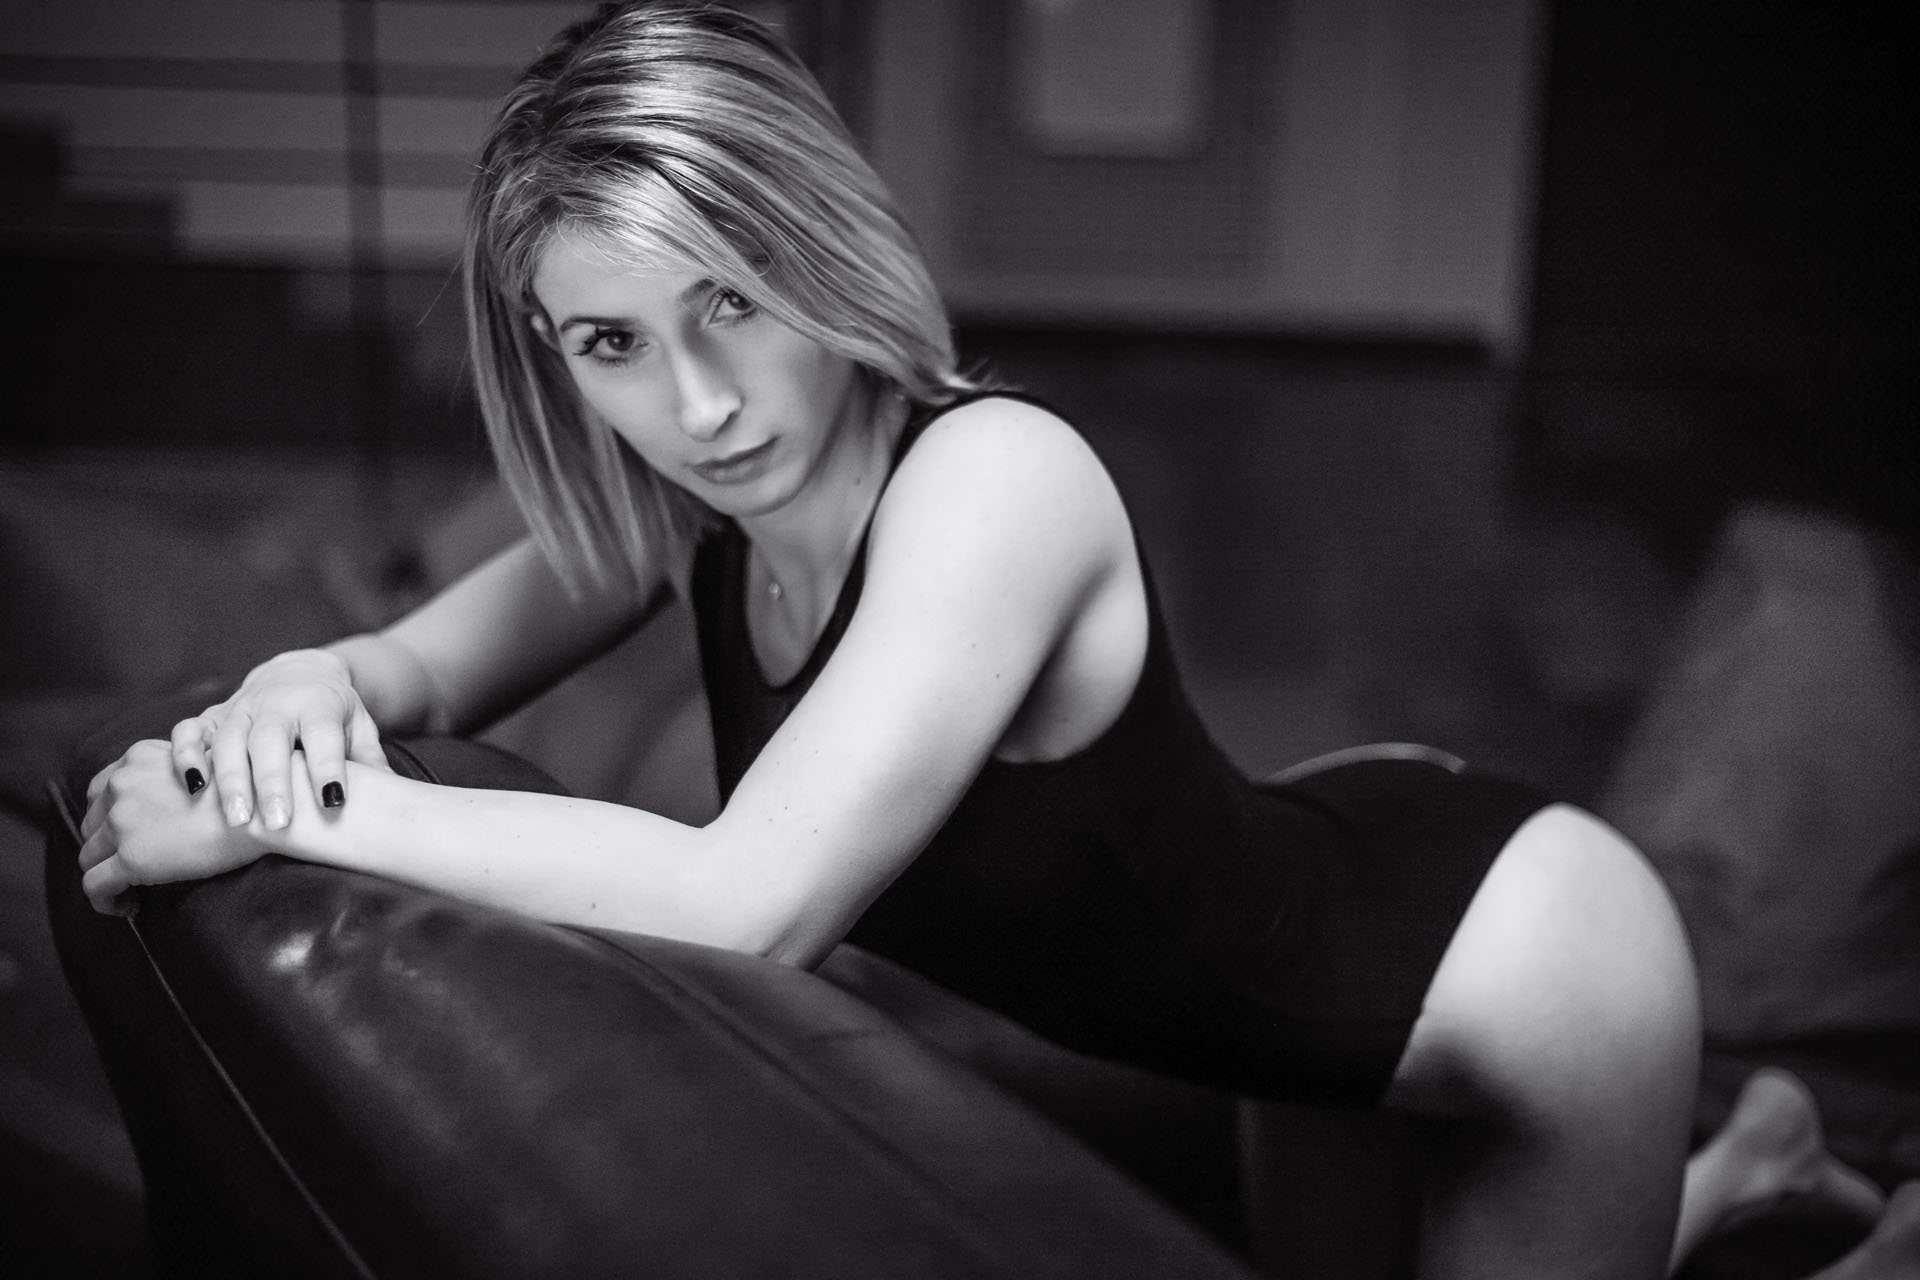 2017-03-02 - Jess Combes - ParadiForm - 3606 - 1920px